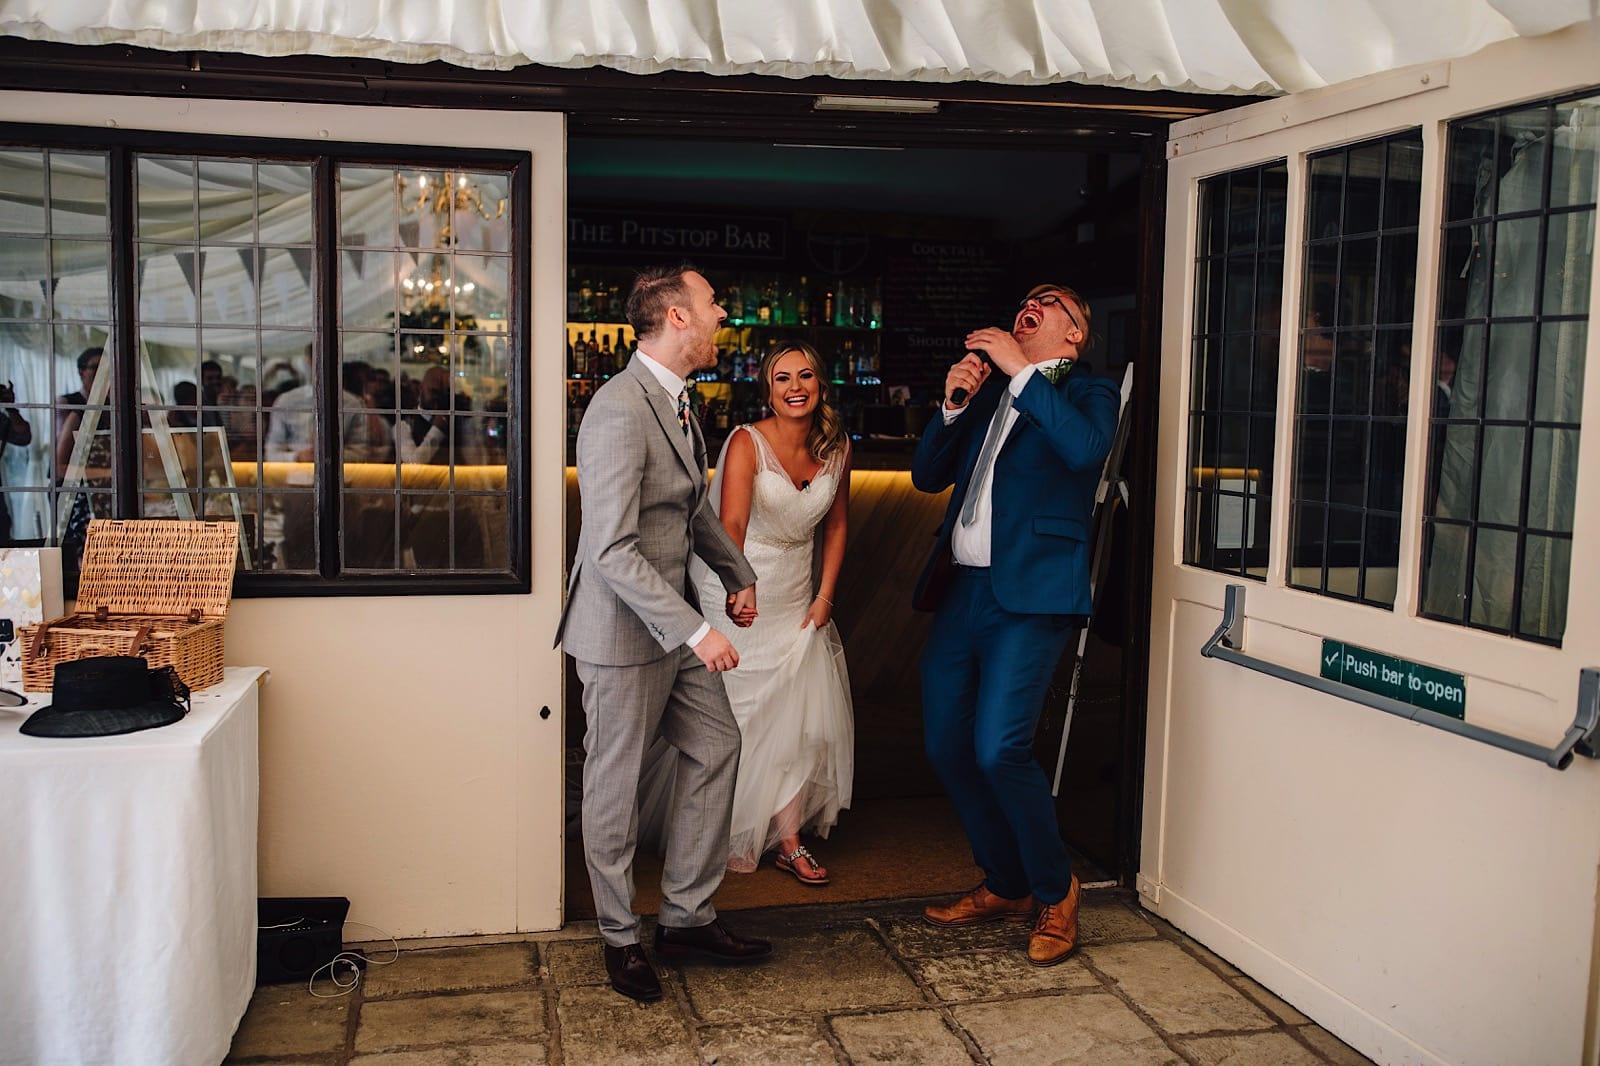 birtsmorton court wedding photography 0048